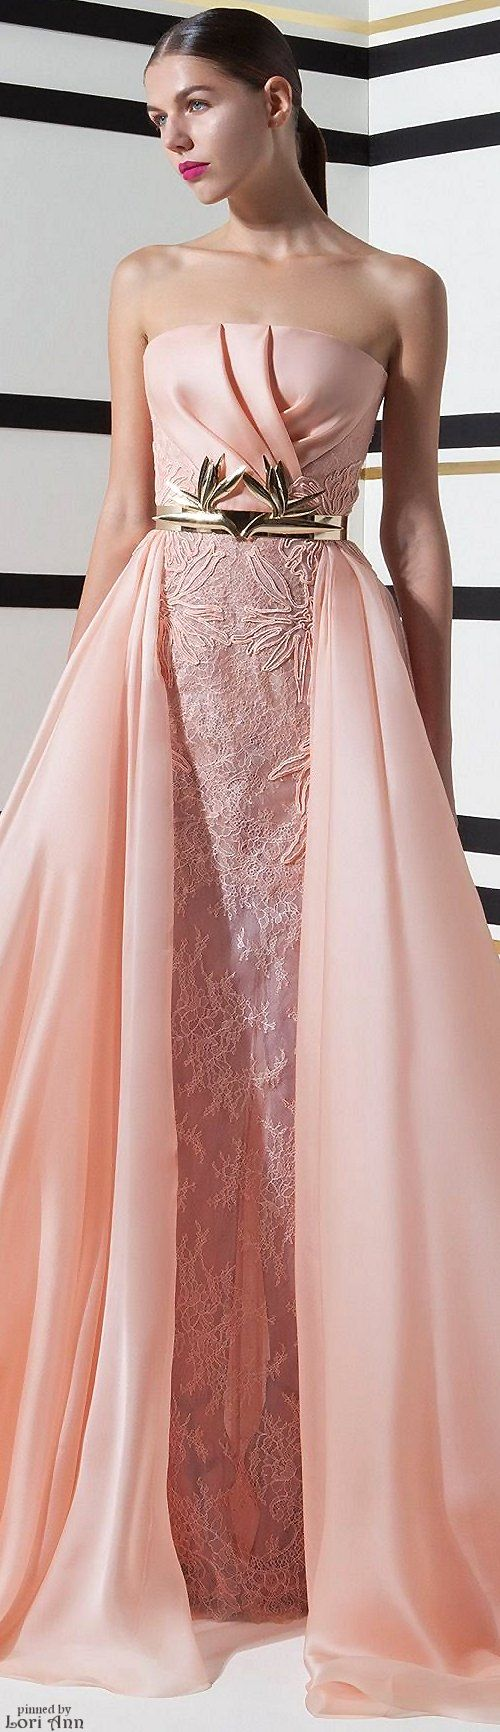 Basil Soda Spring 2016 RTW.....does this make a nice wedding dress ...